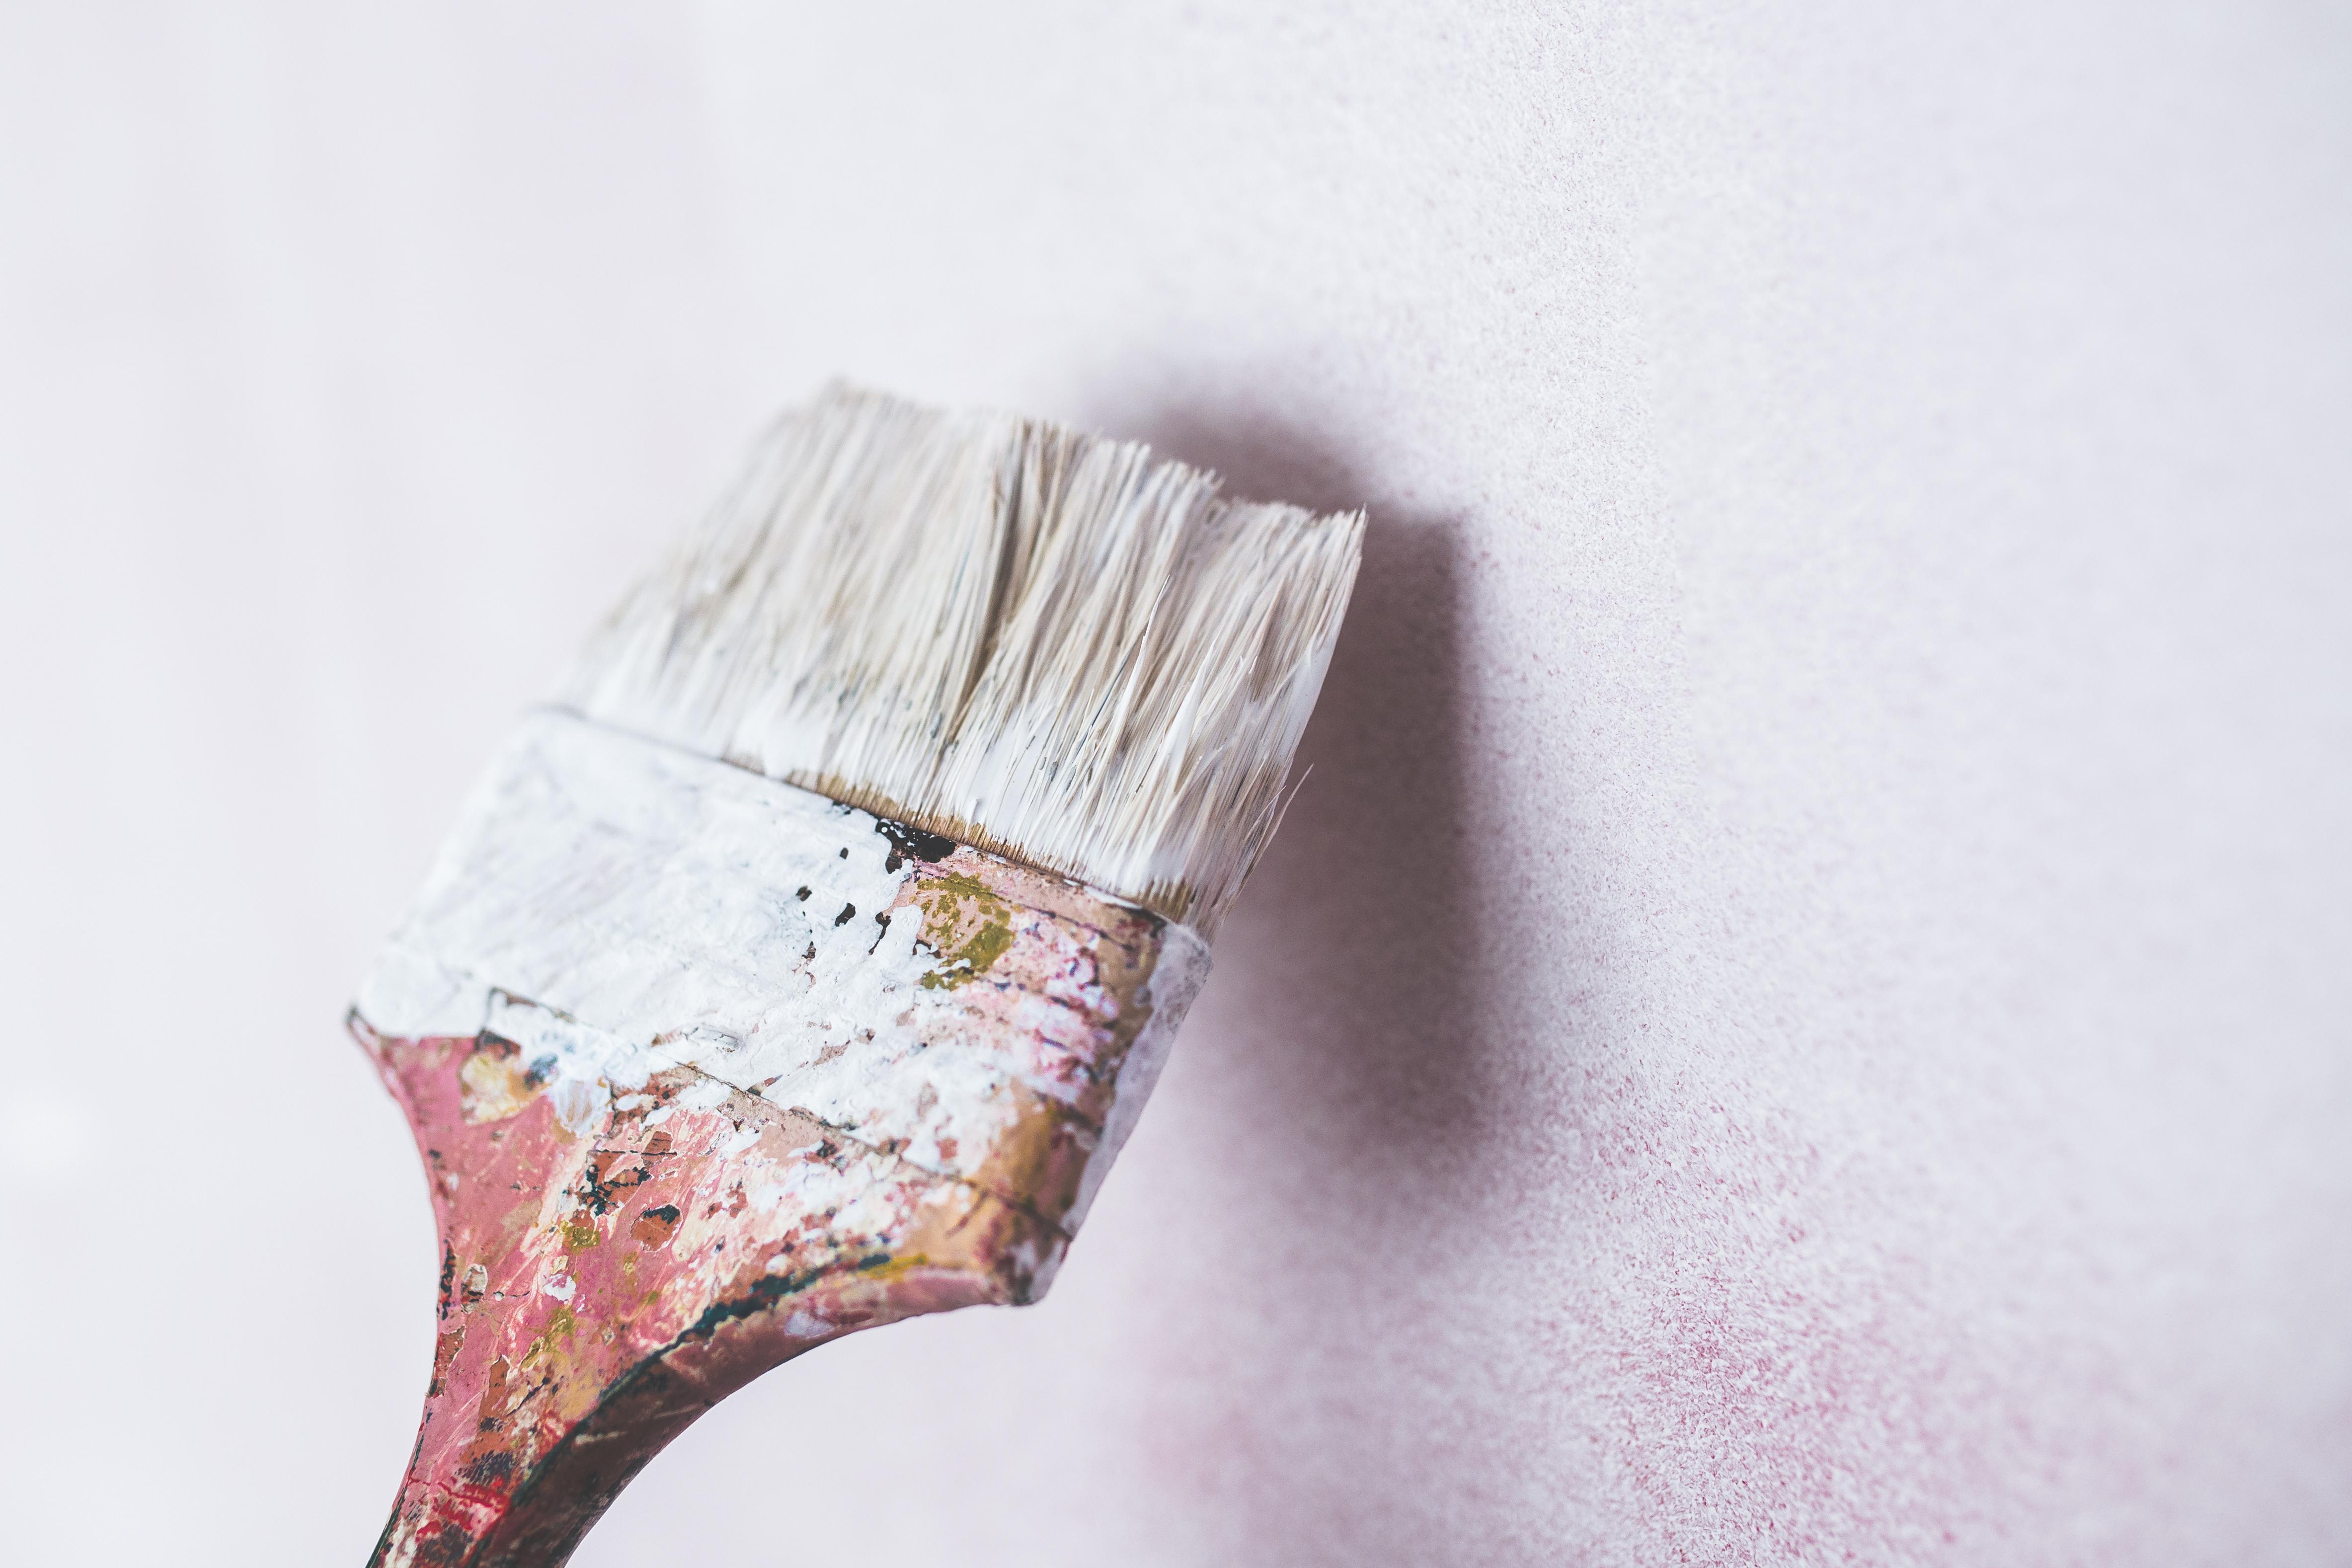 Плюсы ремонта квартиры специалистами под ключ